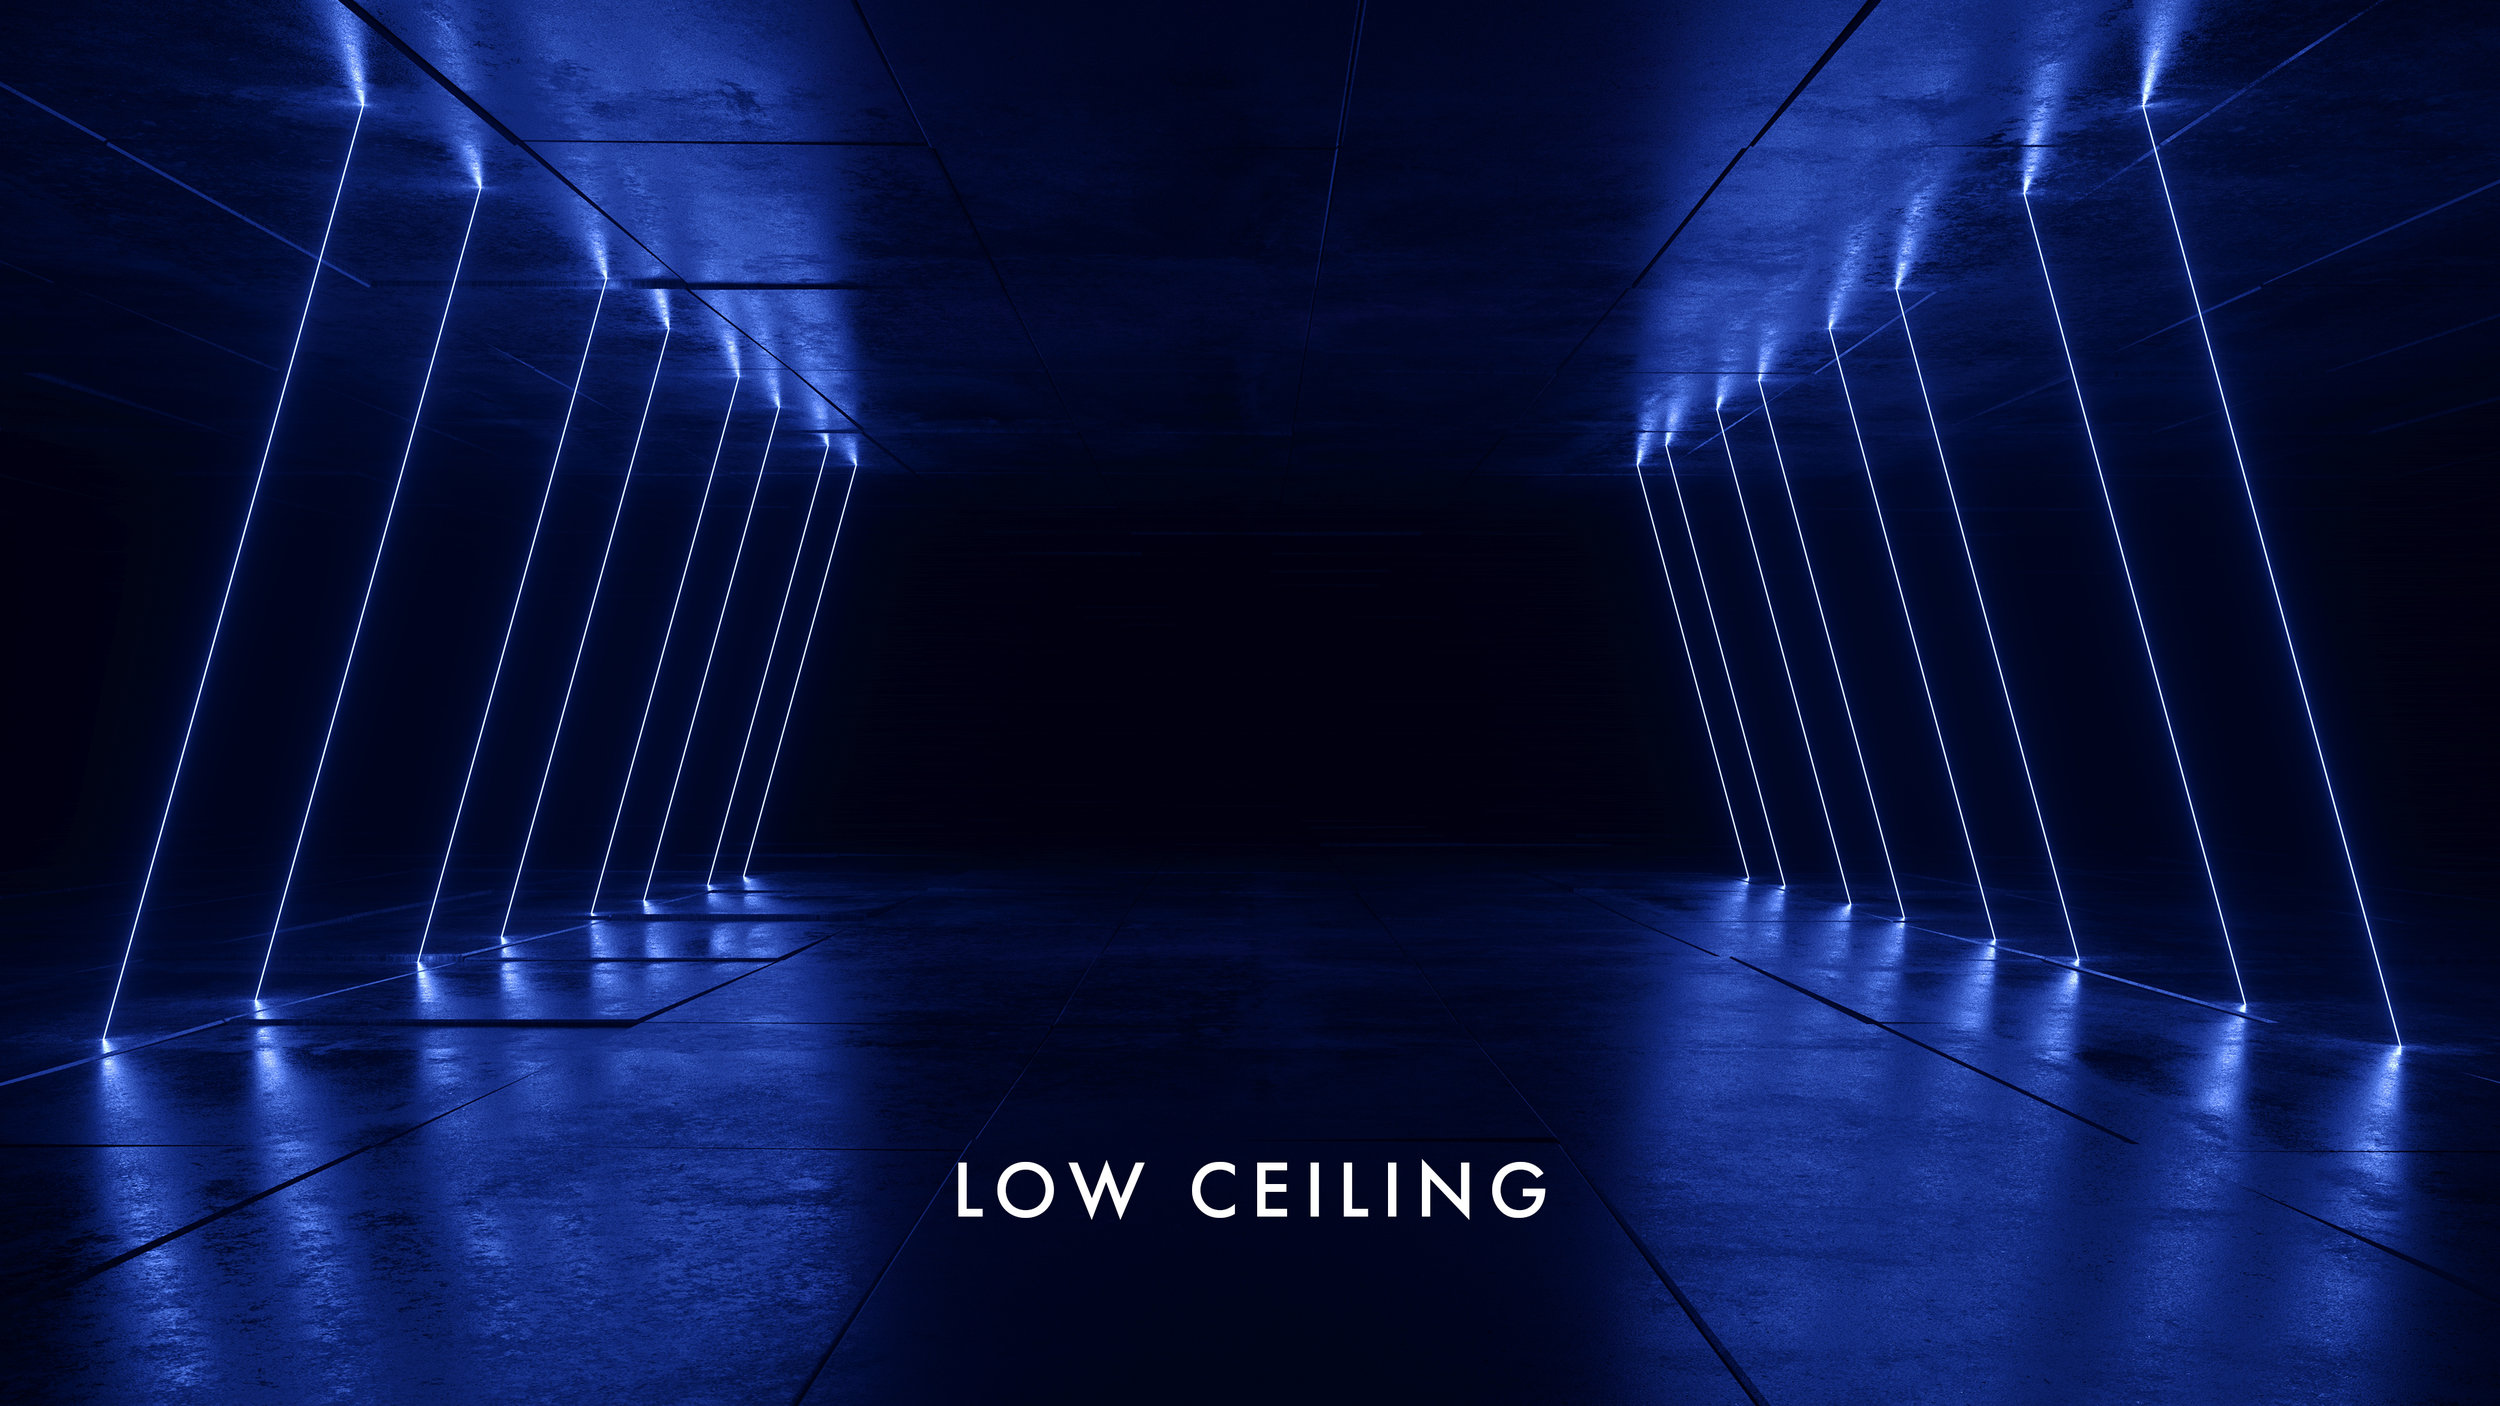 LOW CEILING WALLPAPER2.jpg